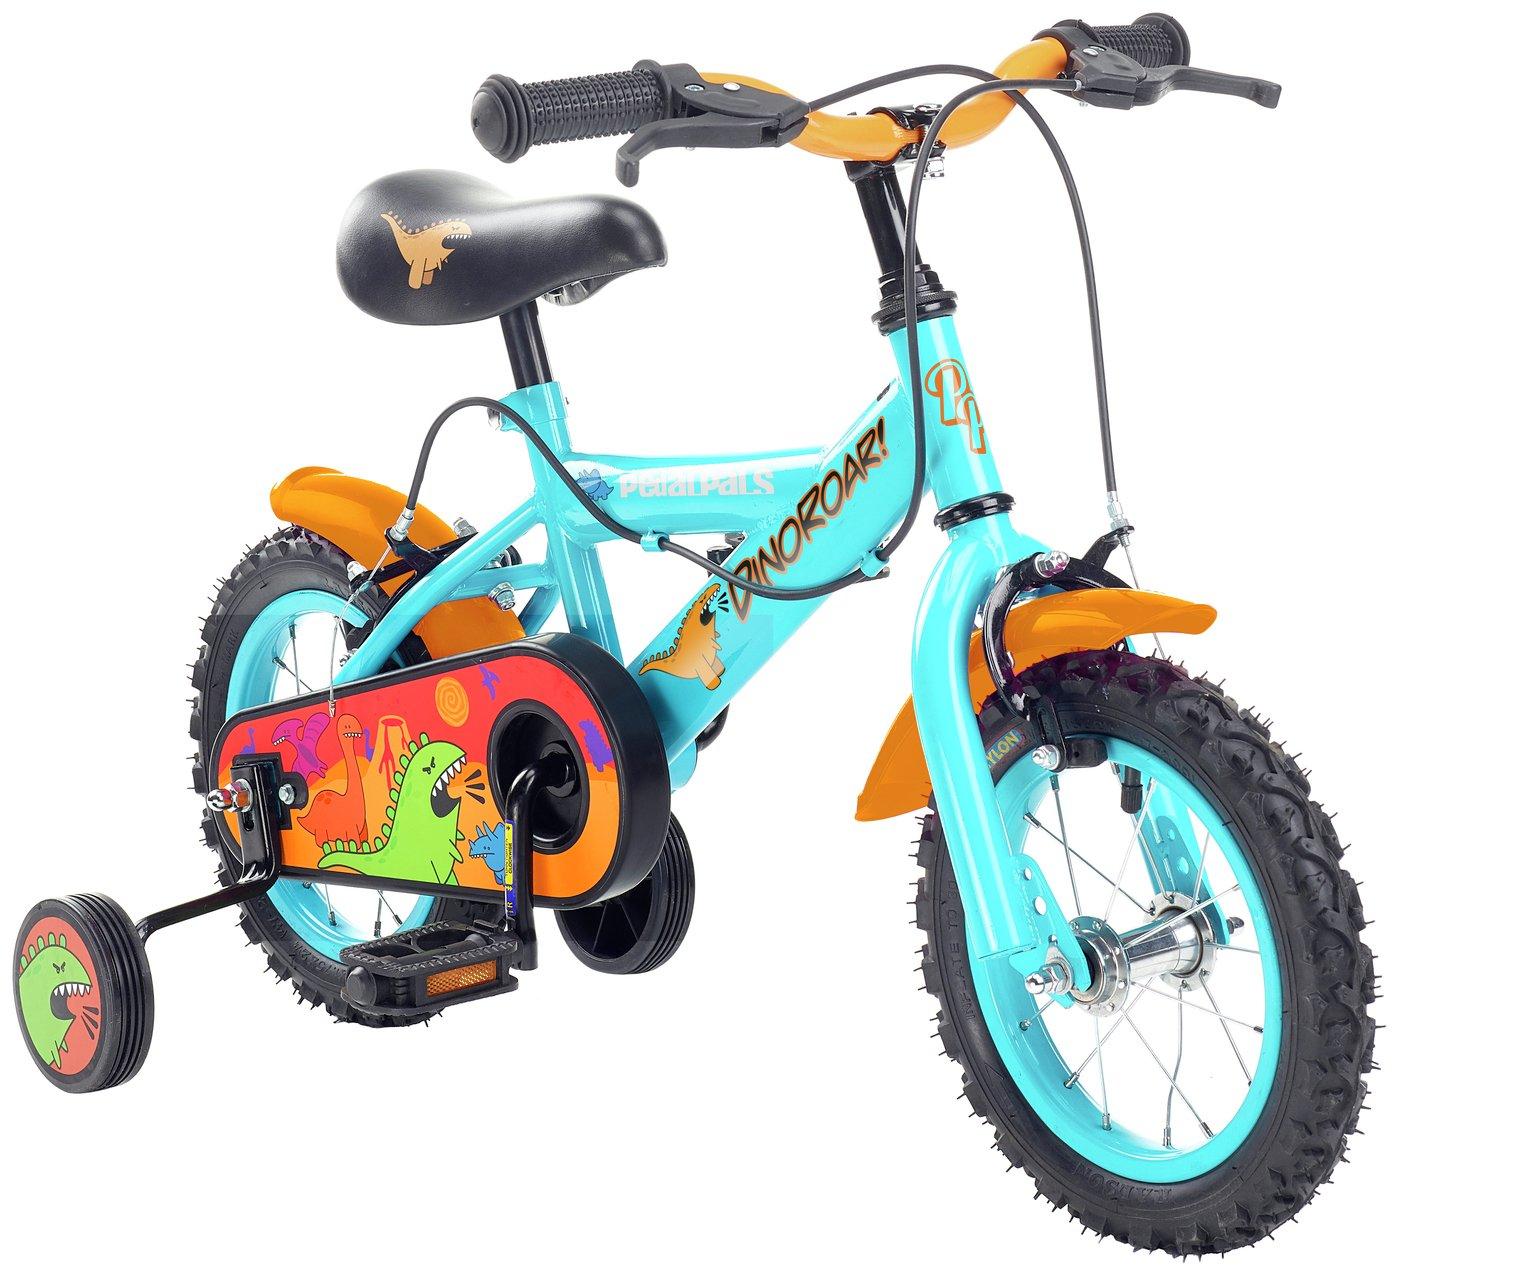 Pedal Pals 12 Inch Dinosaur Kids Bike